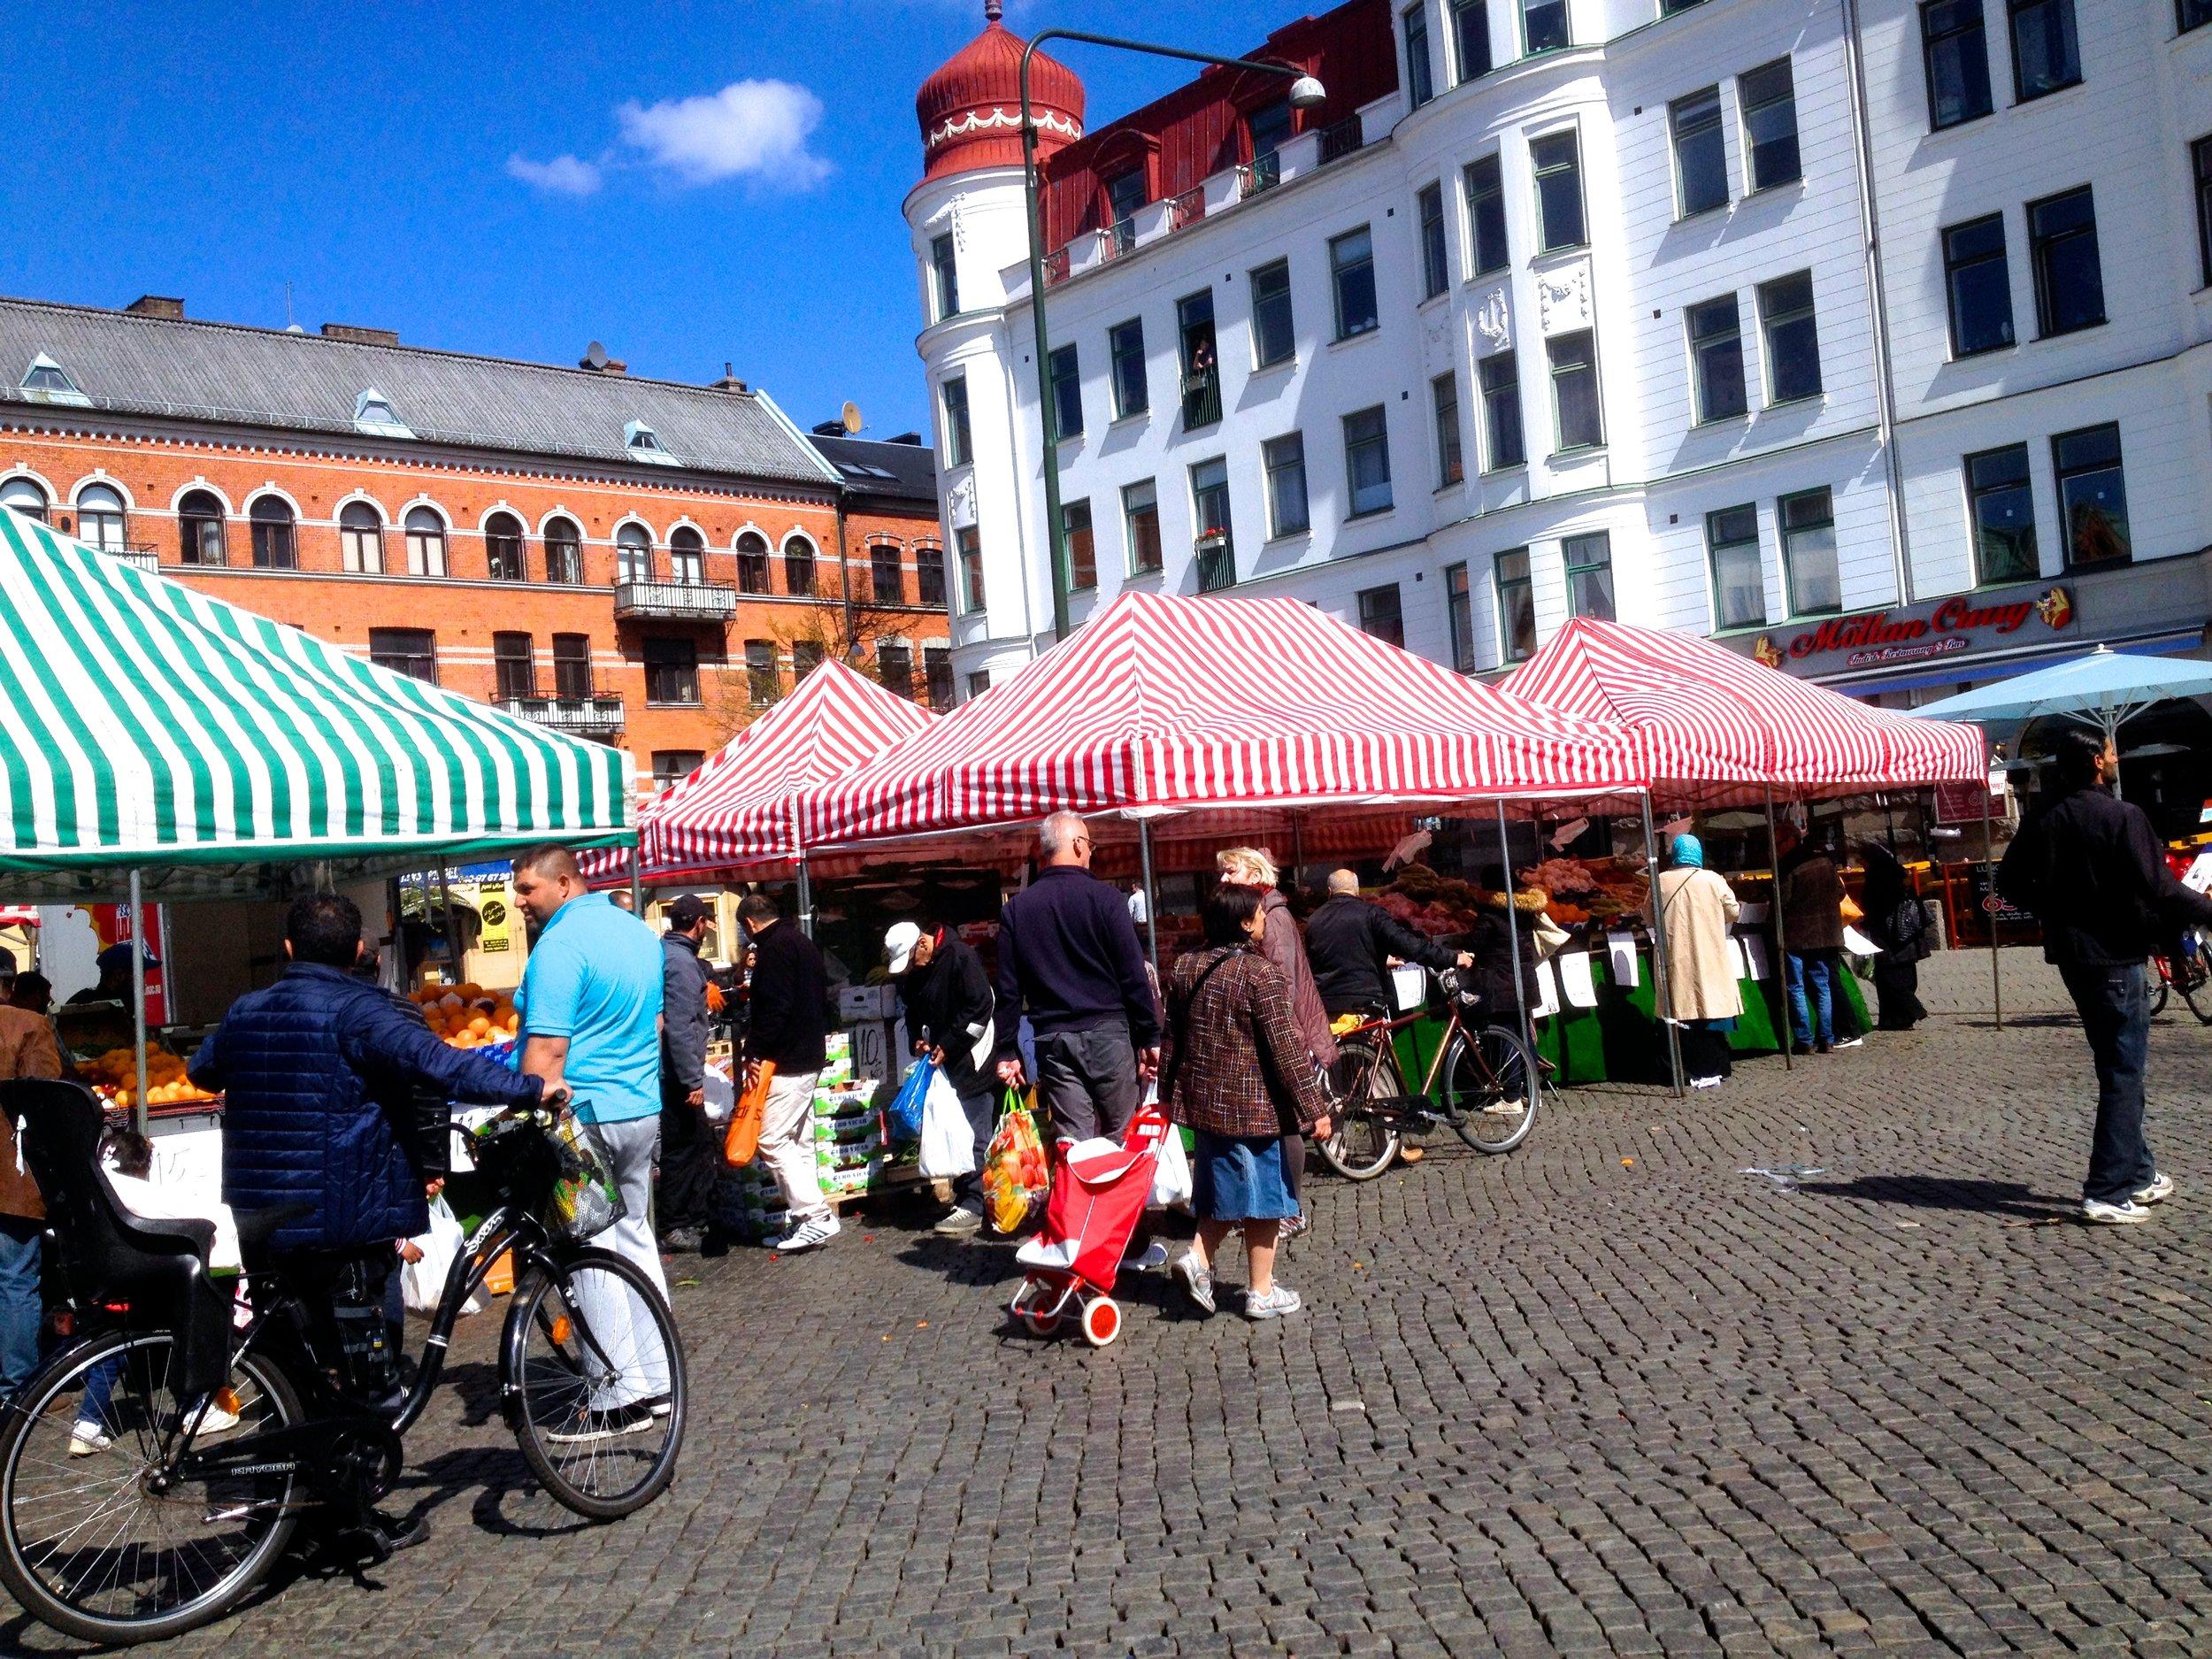 Möllevångs Square